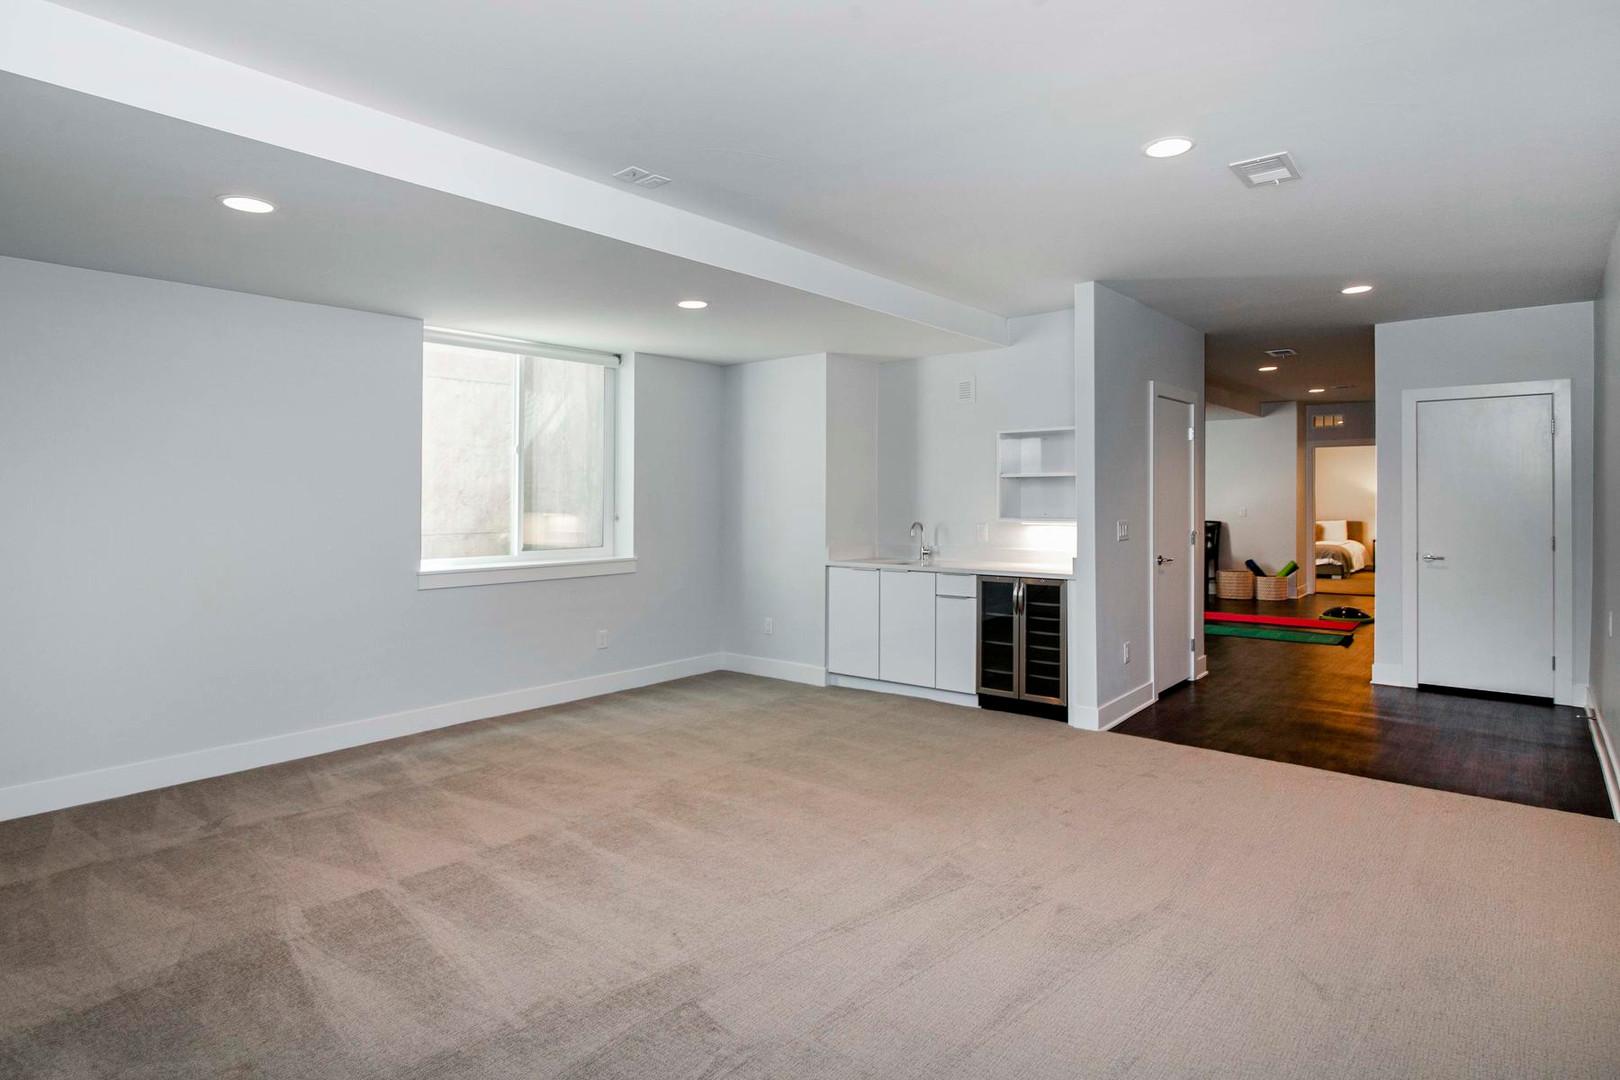 260 S Madison Street-022-040-Lower Level